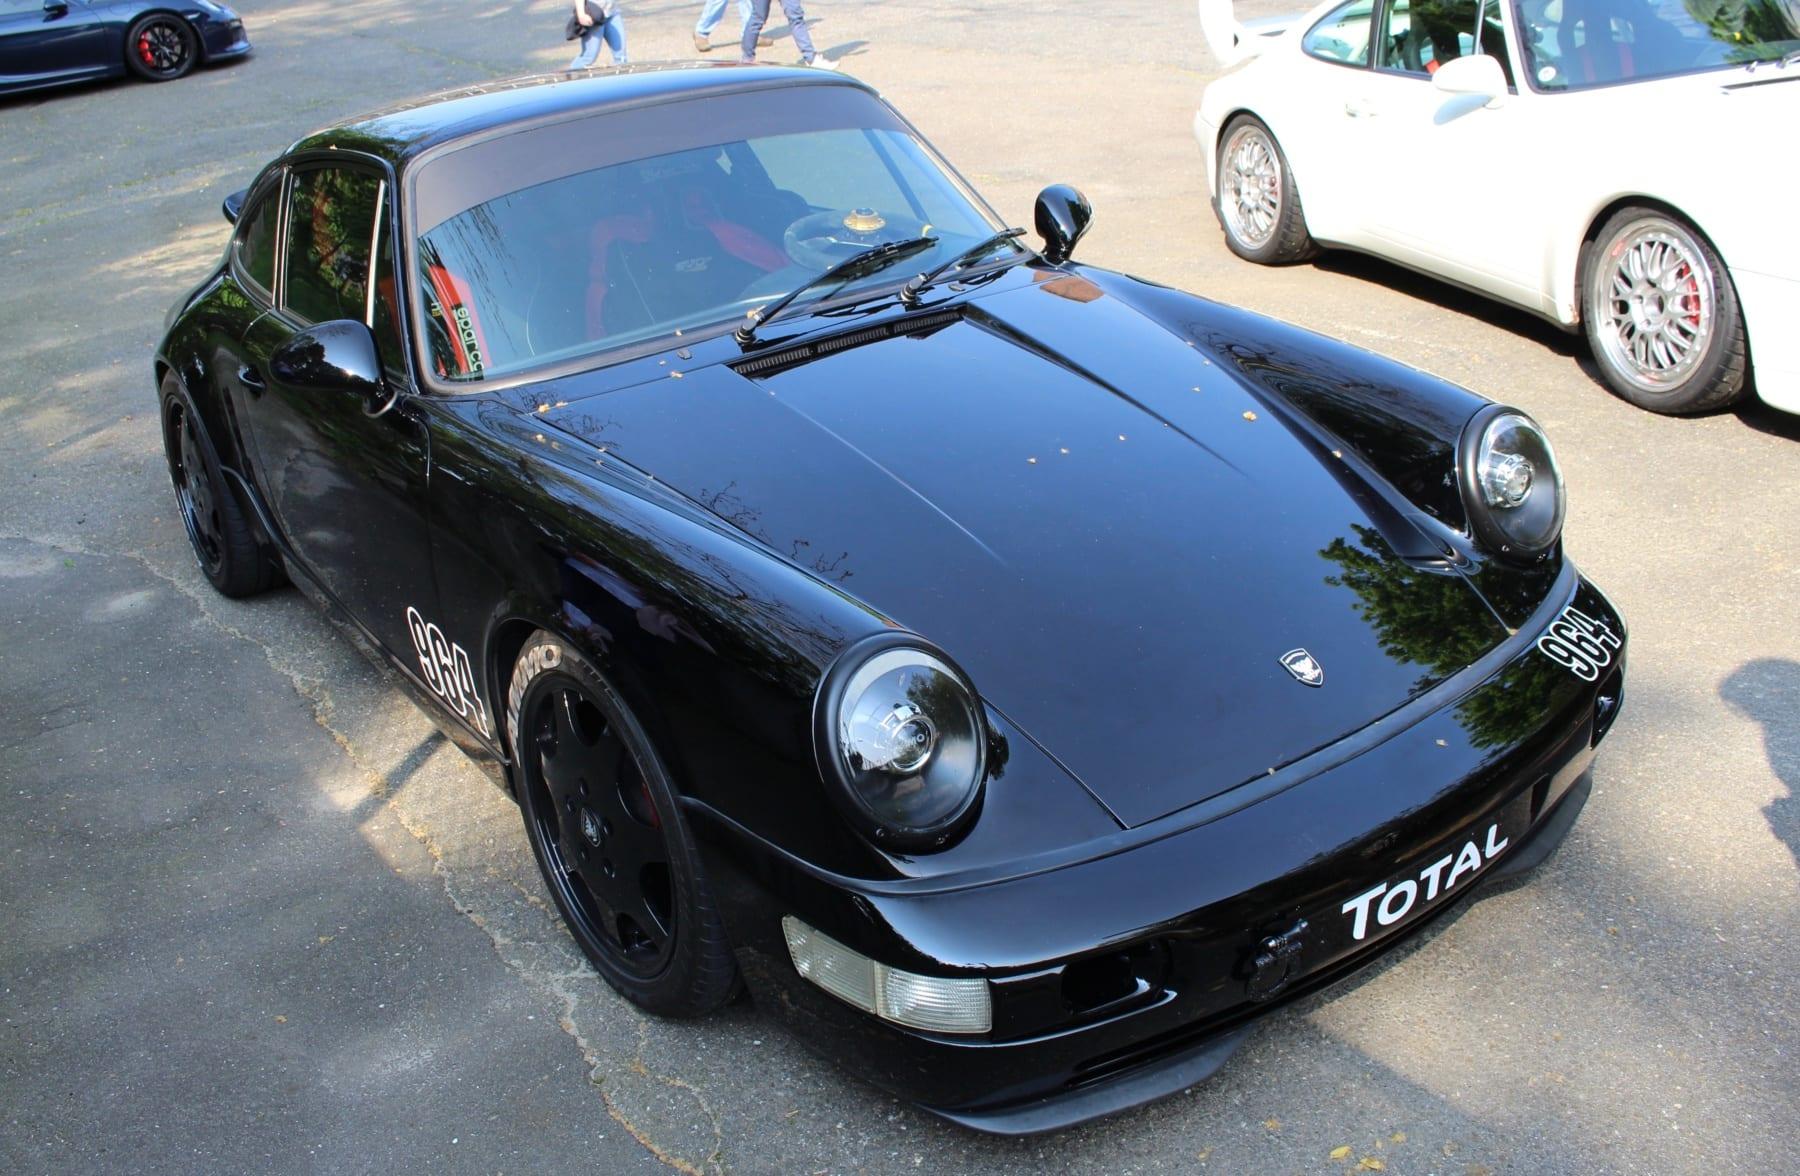 Larry Kosilla of AMMO NYC's Porsche 964 911